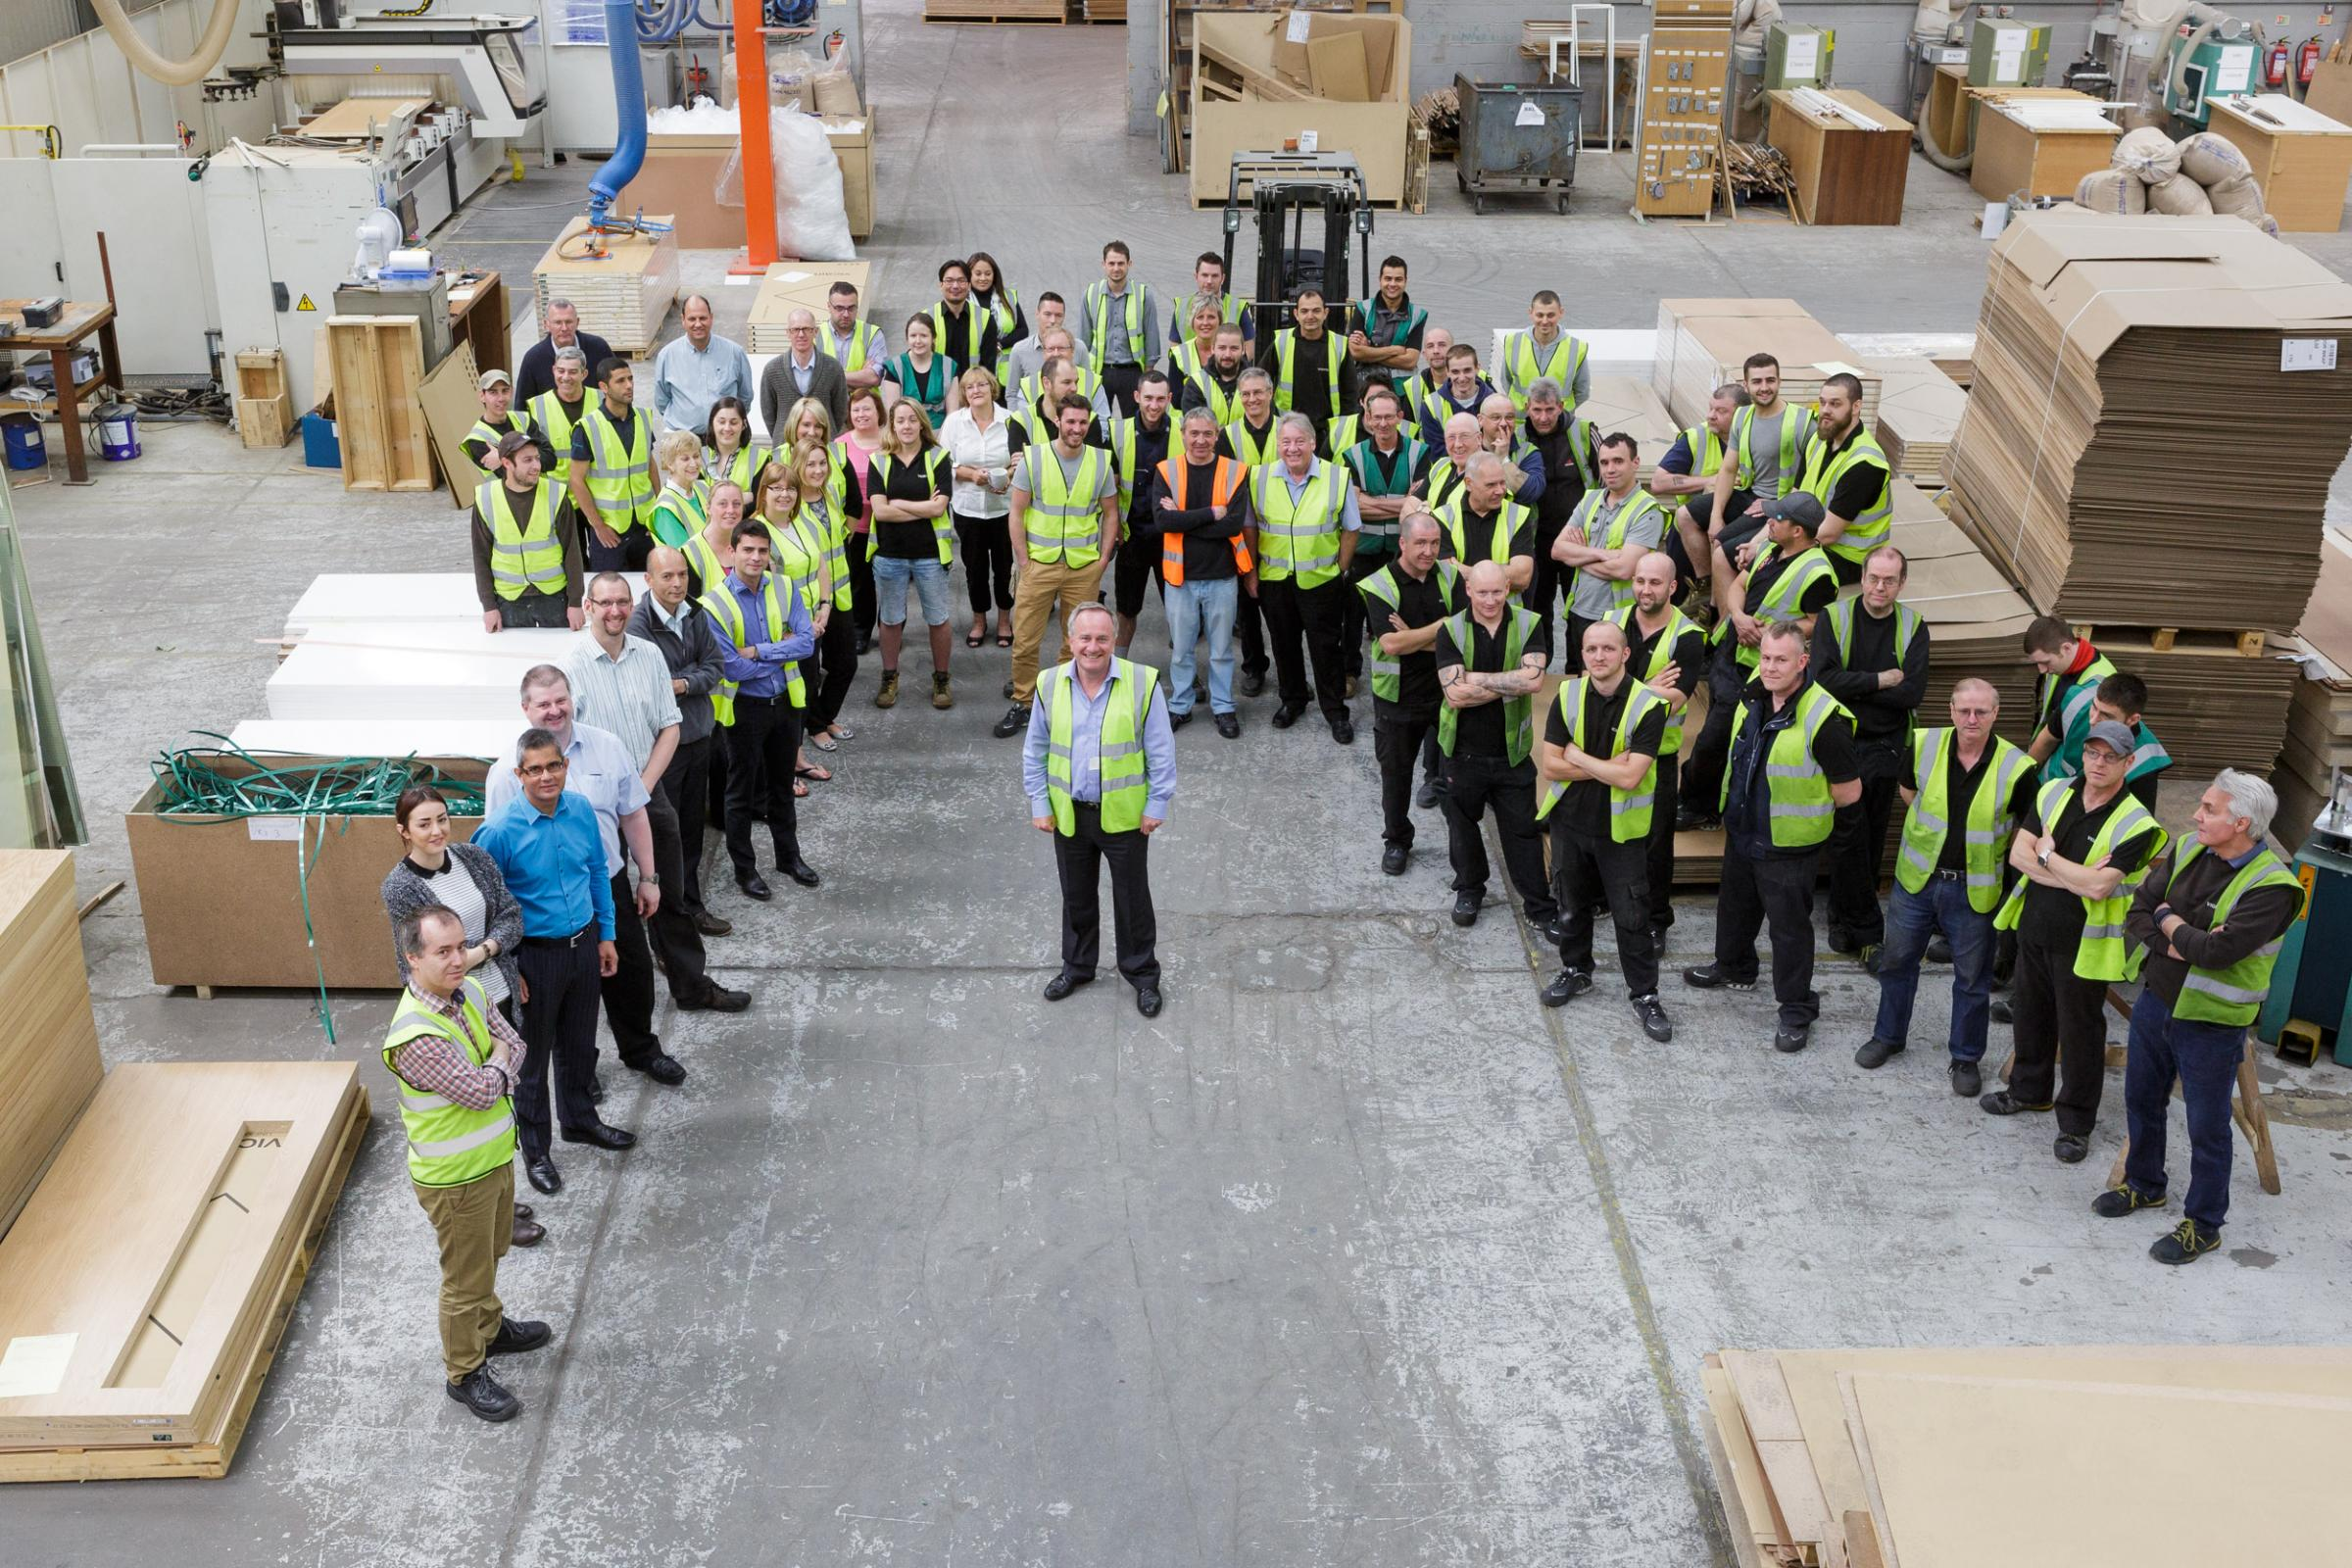 Jobs secured in multi-million pound investment at door manufacturer | Swindon Advertiser & Jobs secured in multi-million pound investment at door manufacturer ...